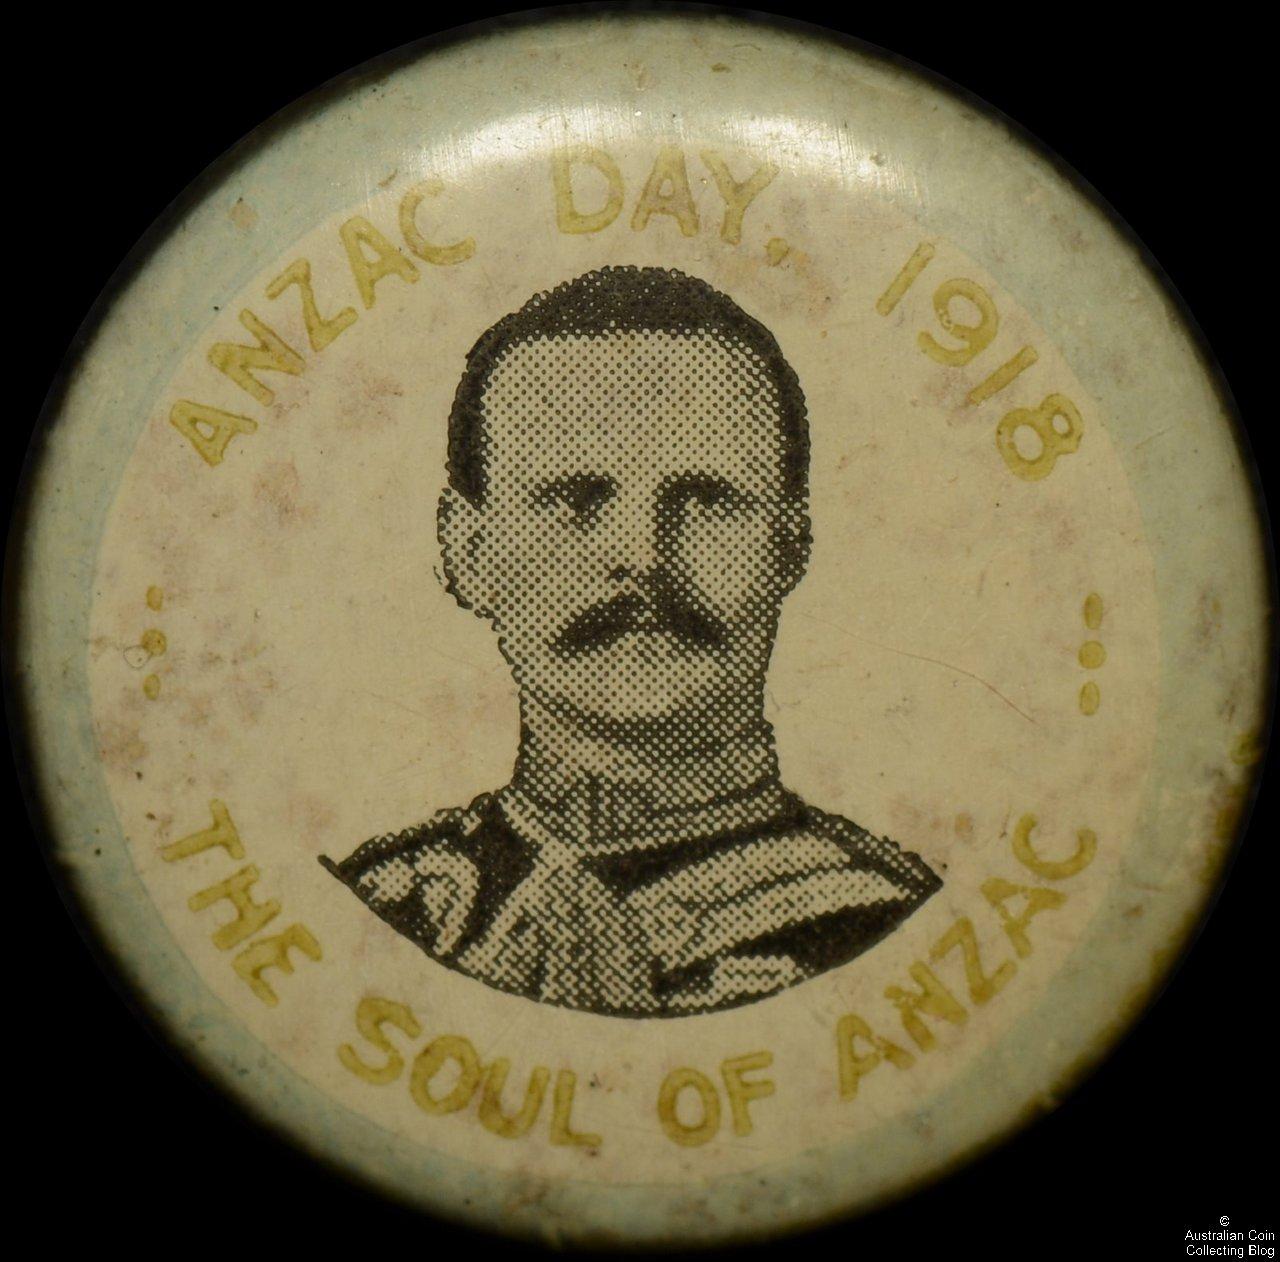 ANZAC Day The Soul of ANZAC Tin Badge